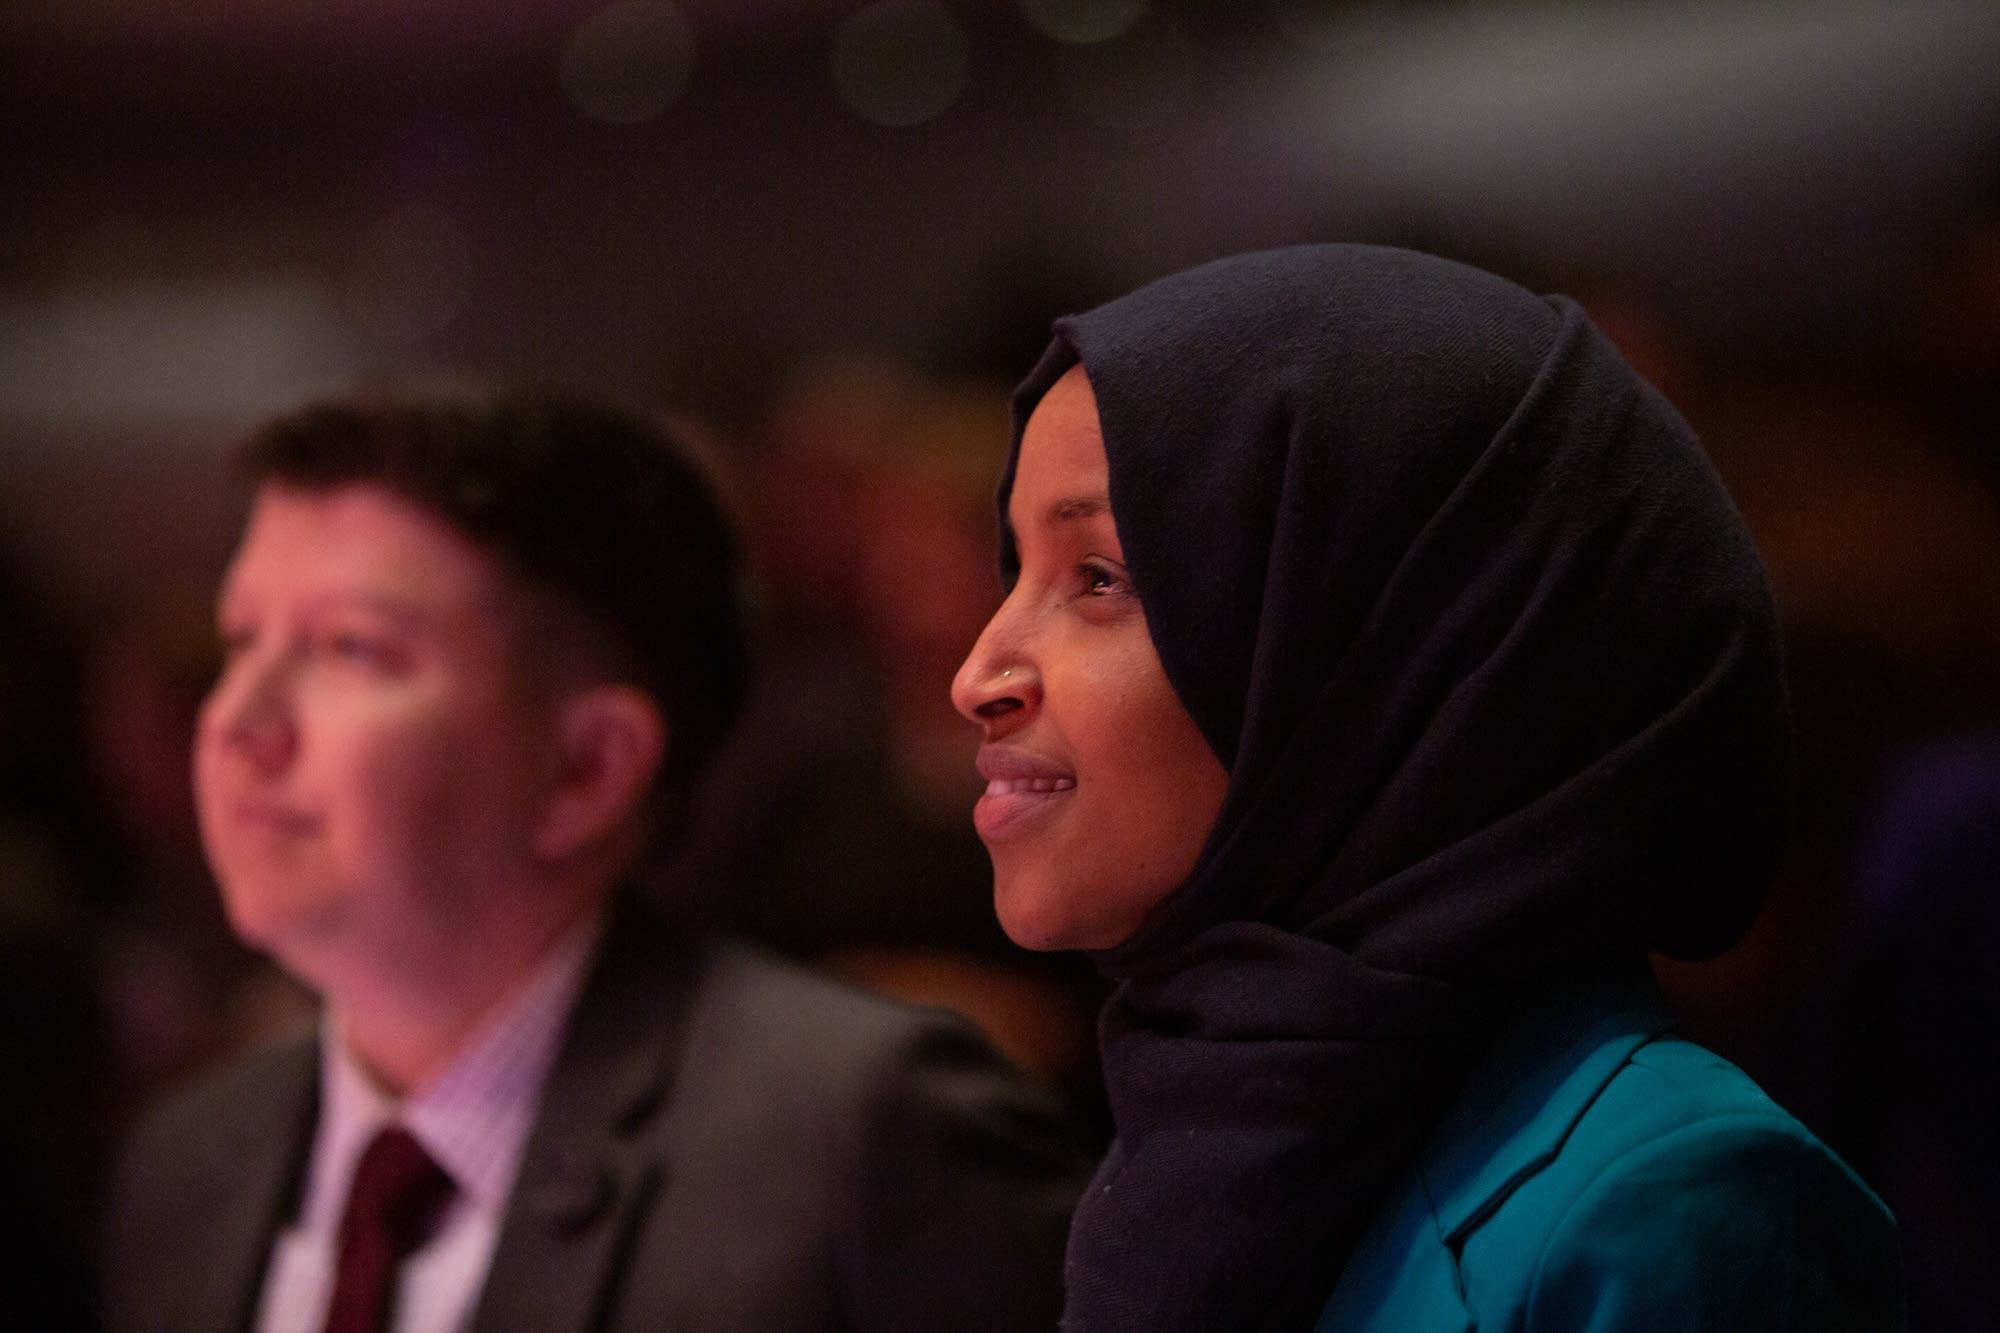 U.S. Rep. Ilhan Omar listens to keynote speaker Dr. Mae Jemison.